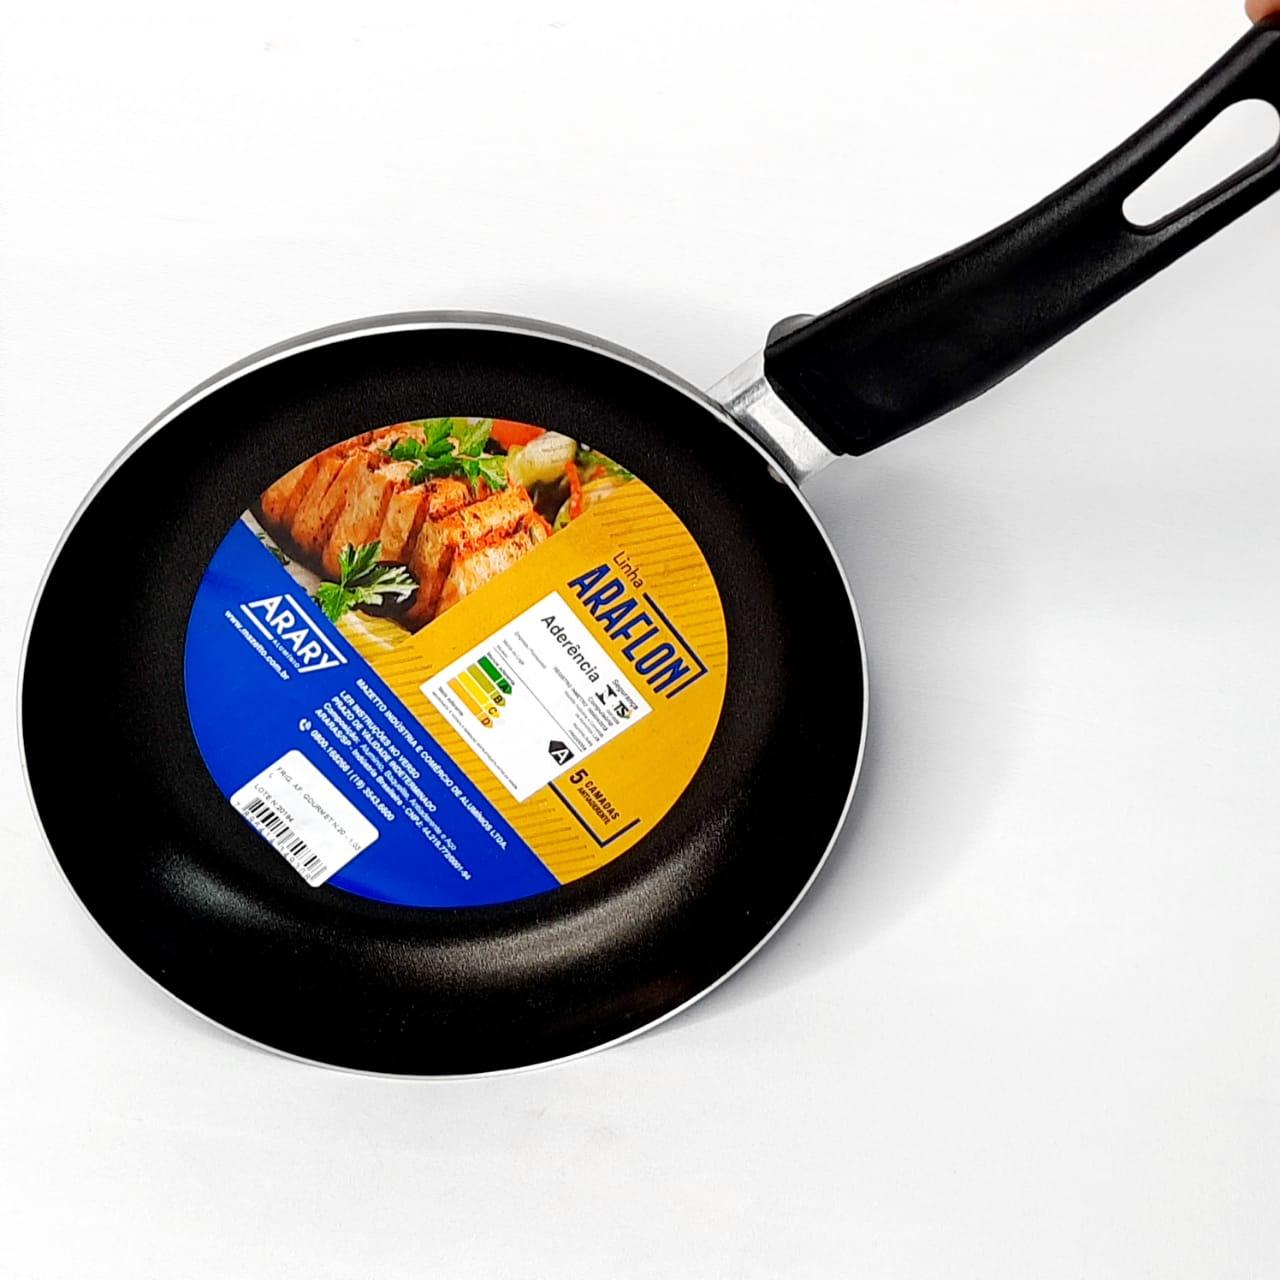 Frigideira Gourmet Alumínio Antiaderente N 20 Arary